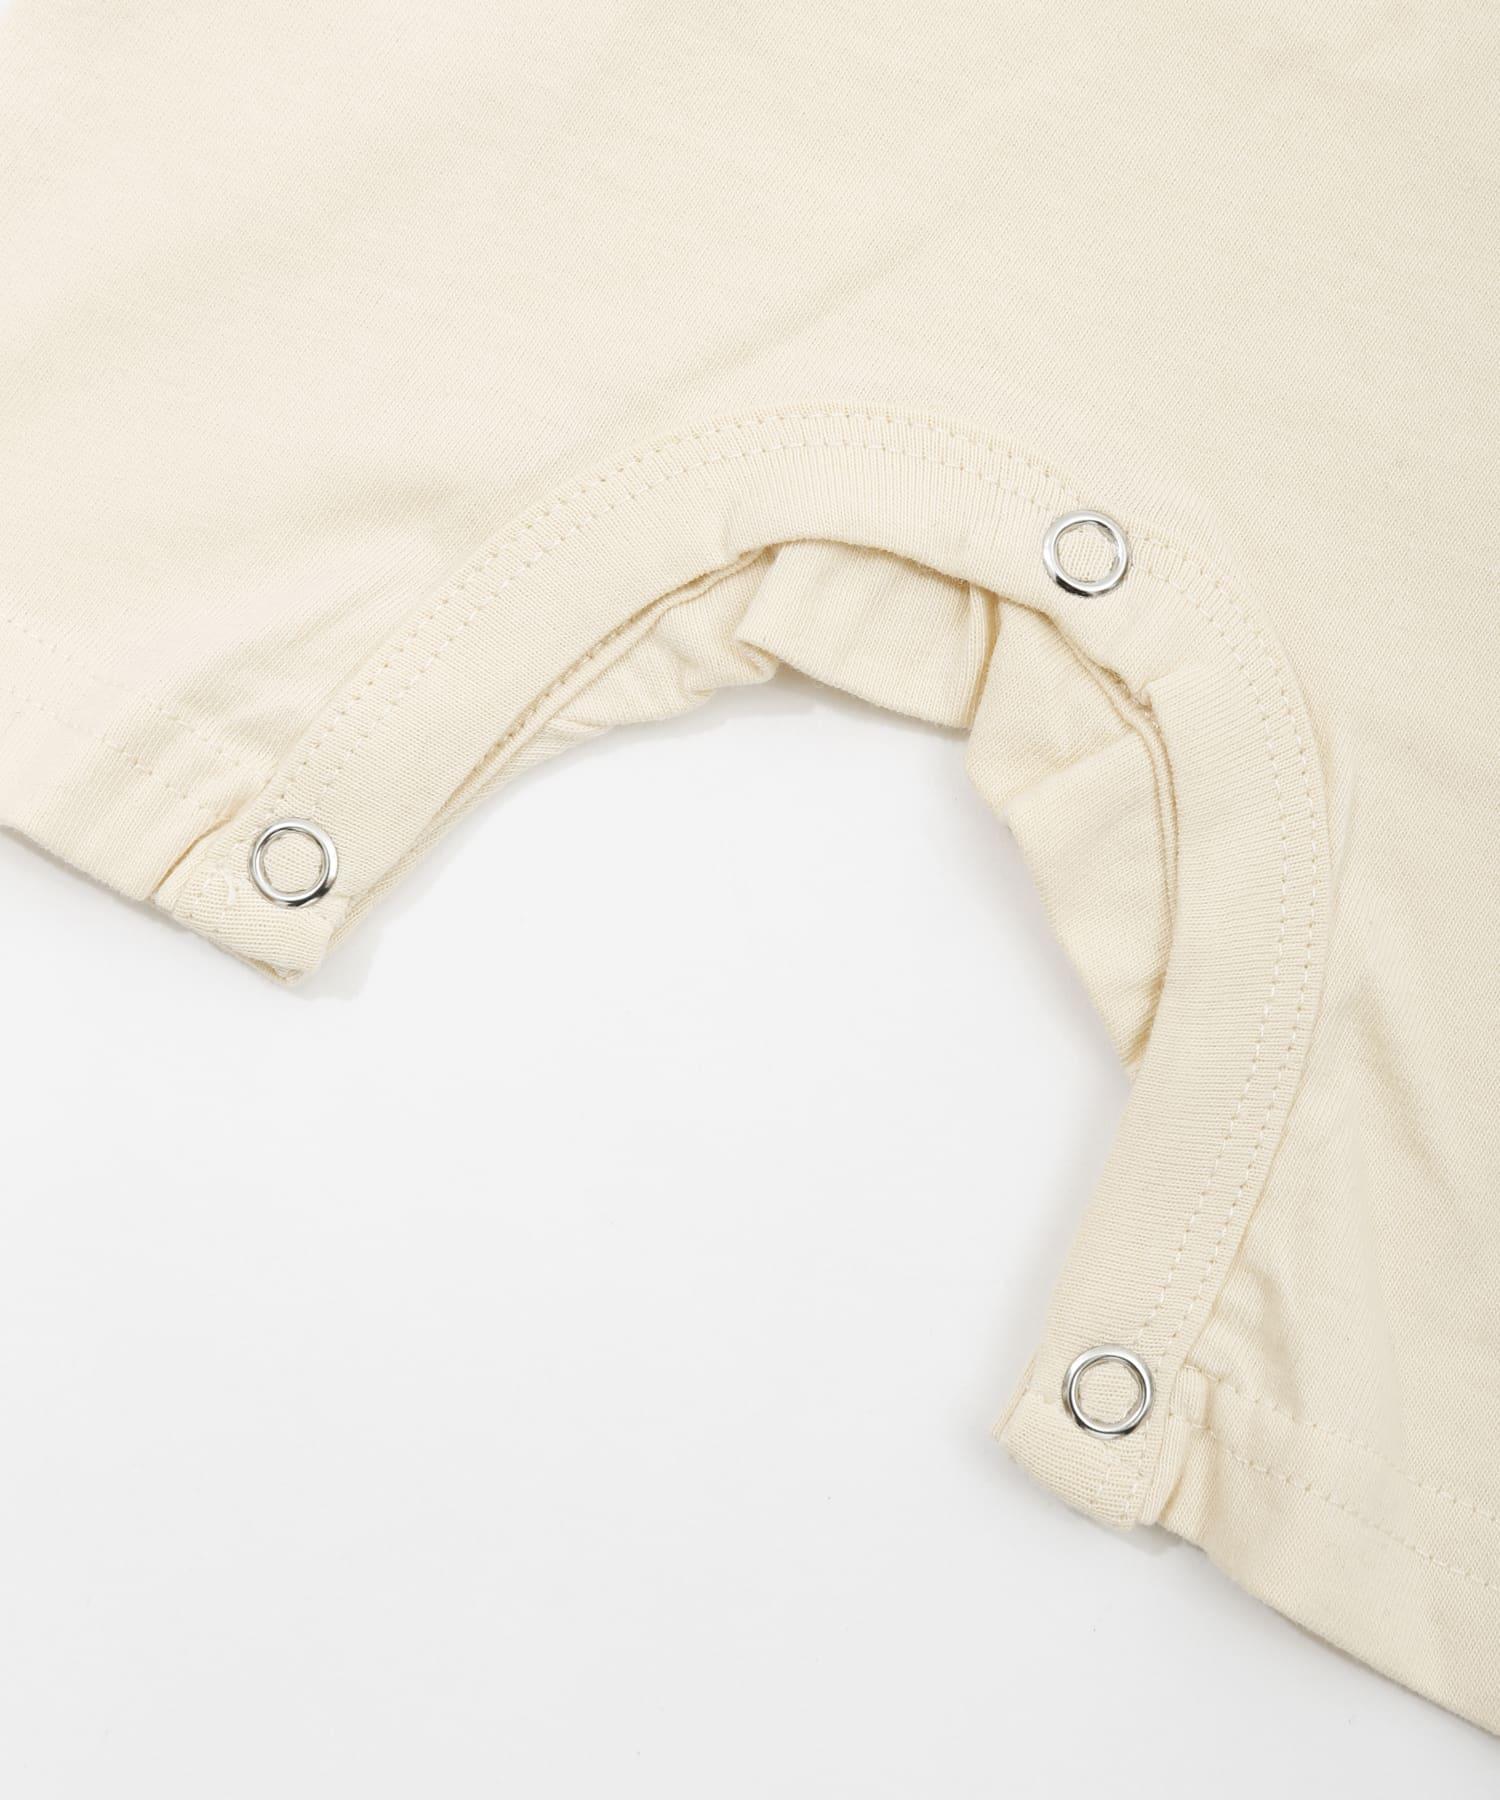 3COINS(スリーコインズ) 【おめかし・一部店舗限定】ロンパース 70cm